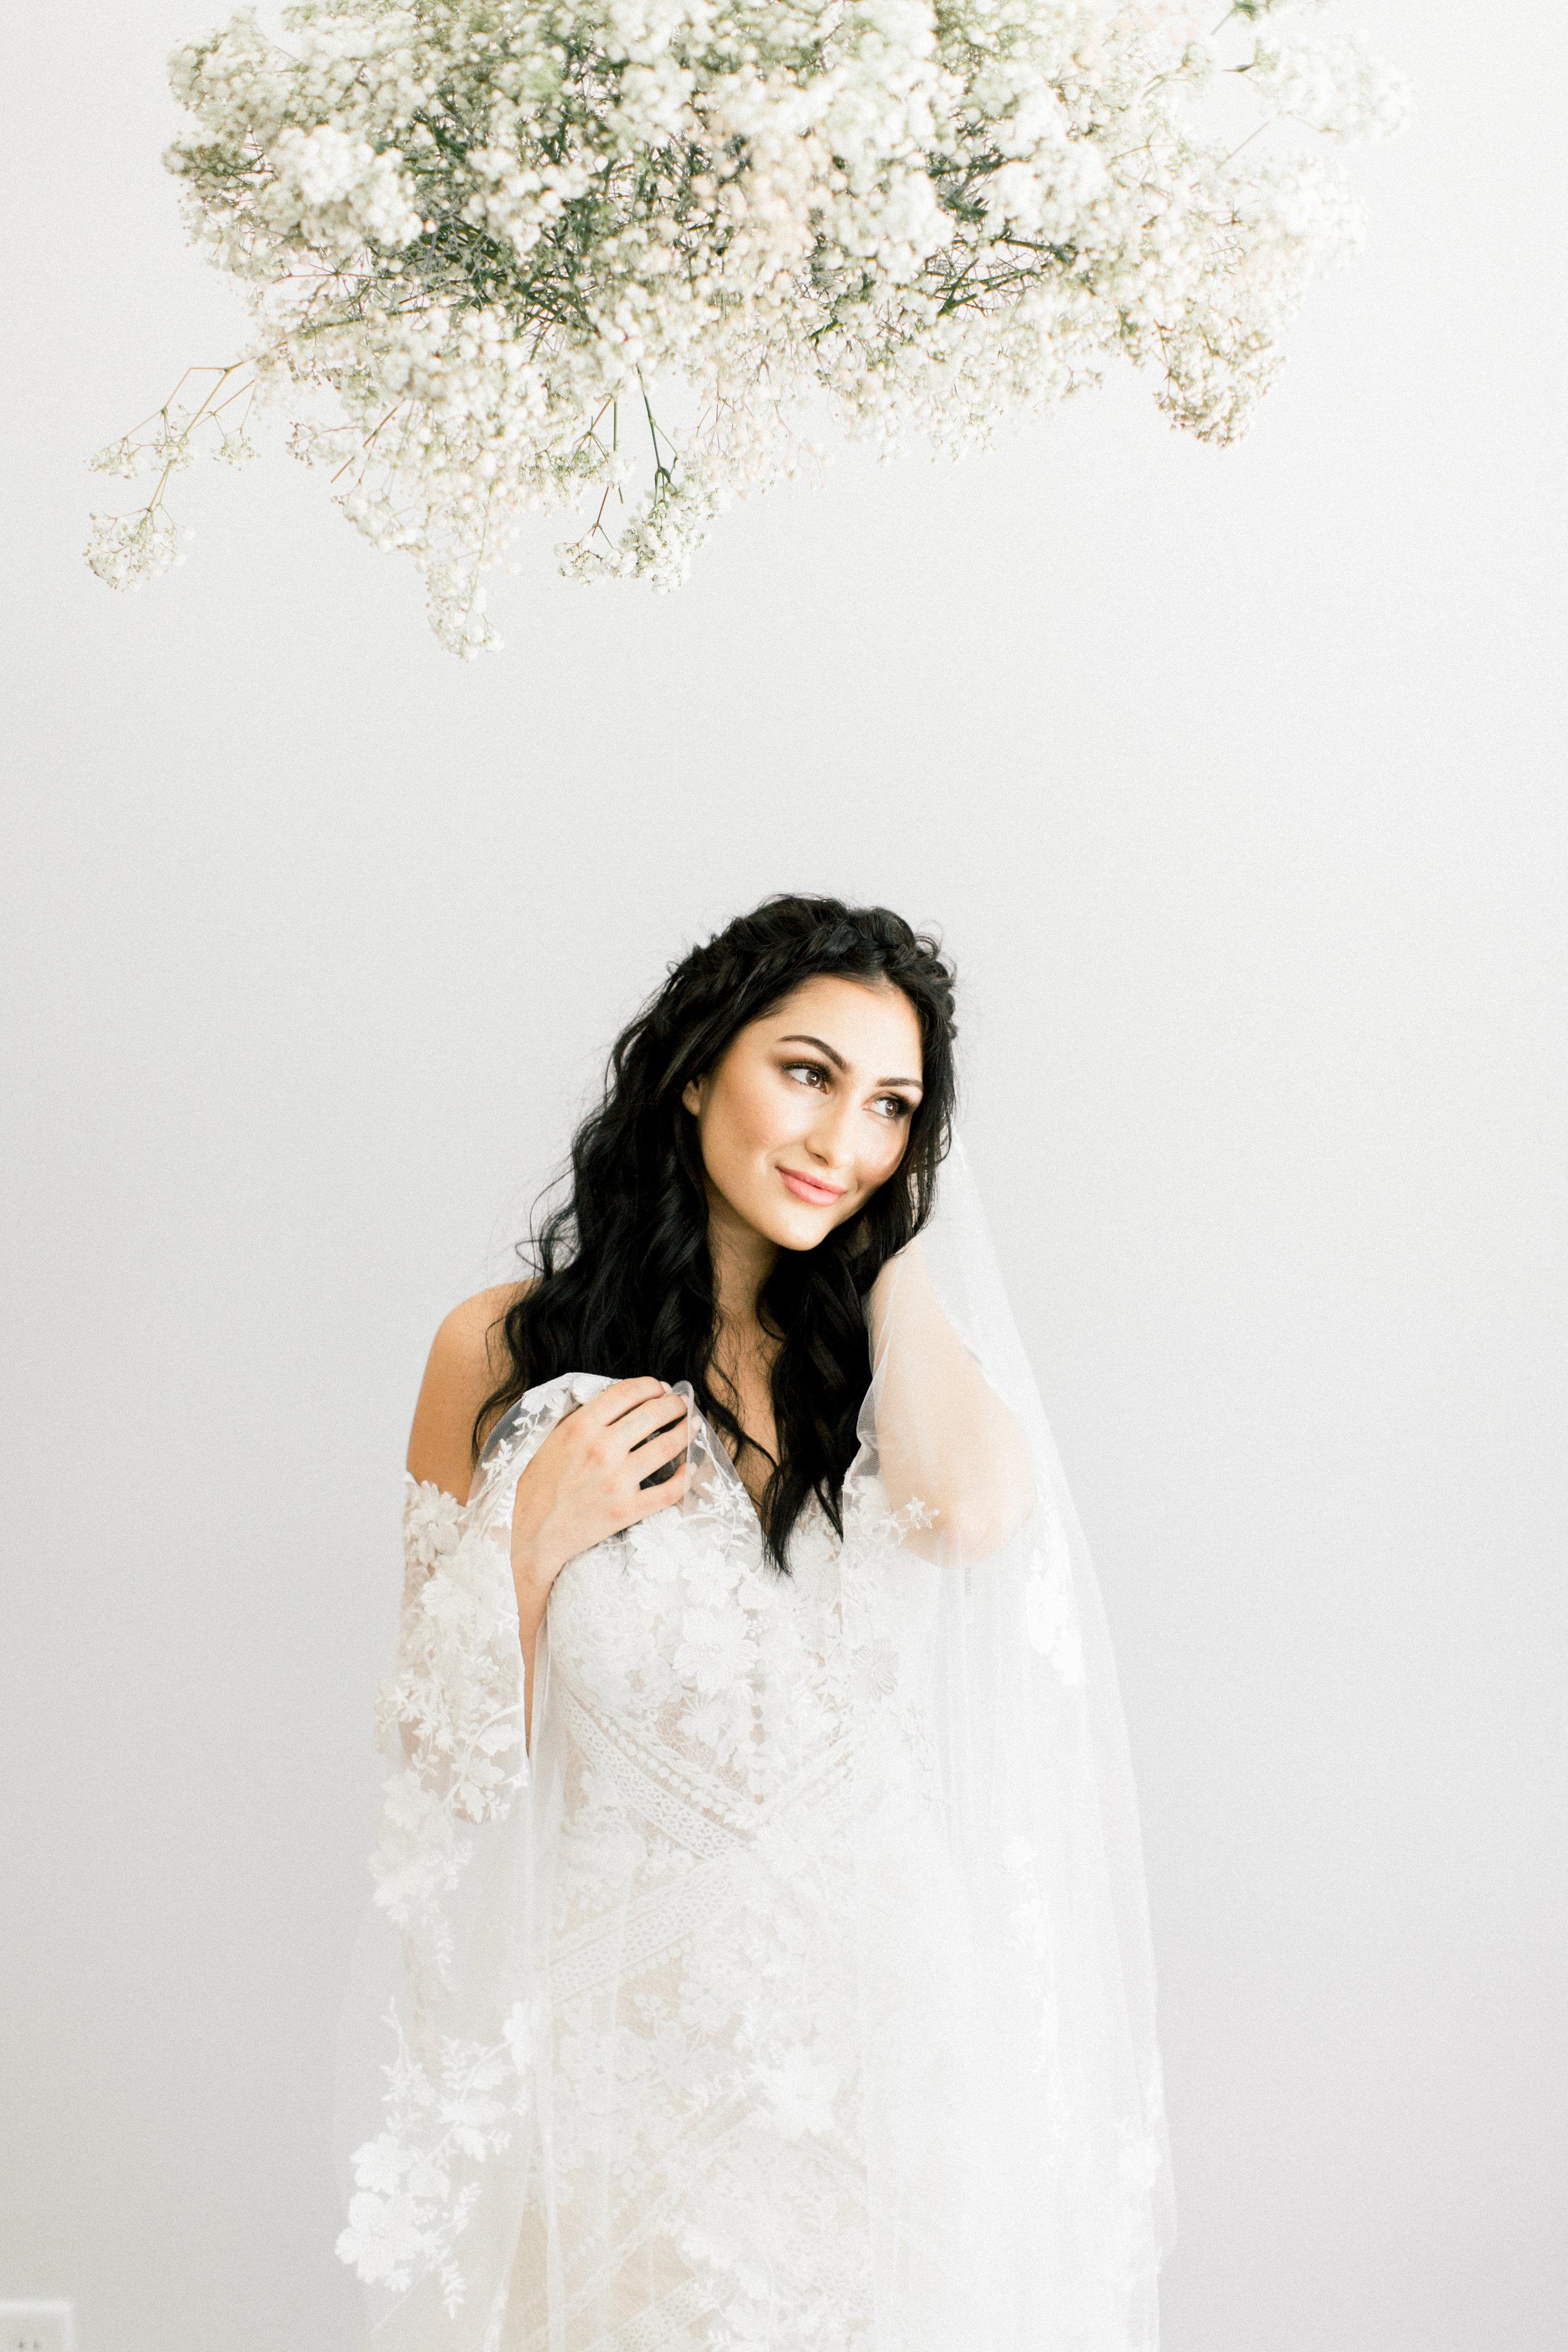 Bridal Gown Lookbook - Arizona florist Phoenix Scottsdale Sedona - Baby's Breath Cloud